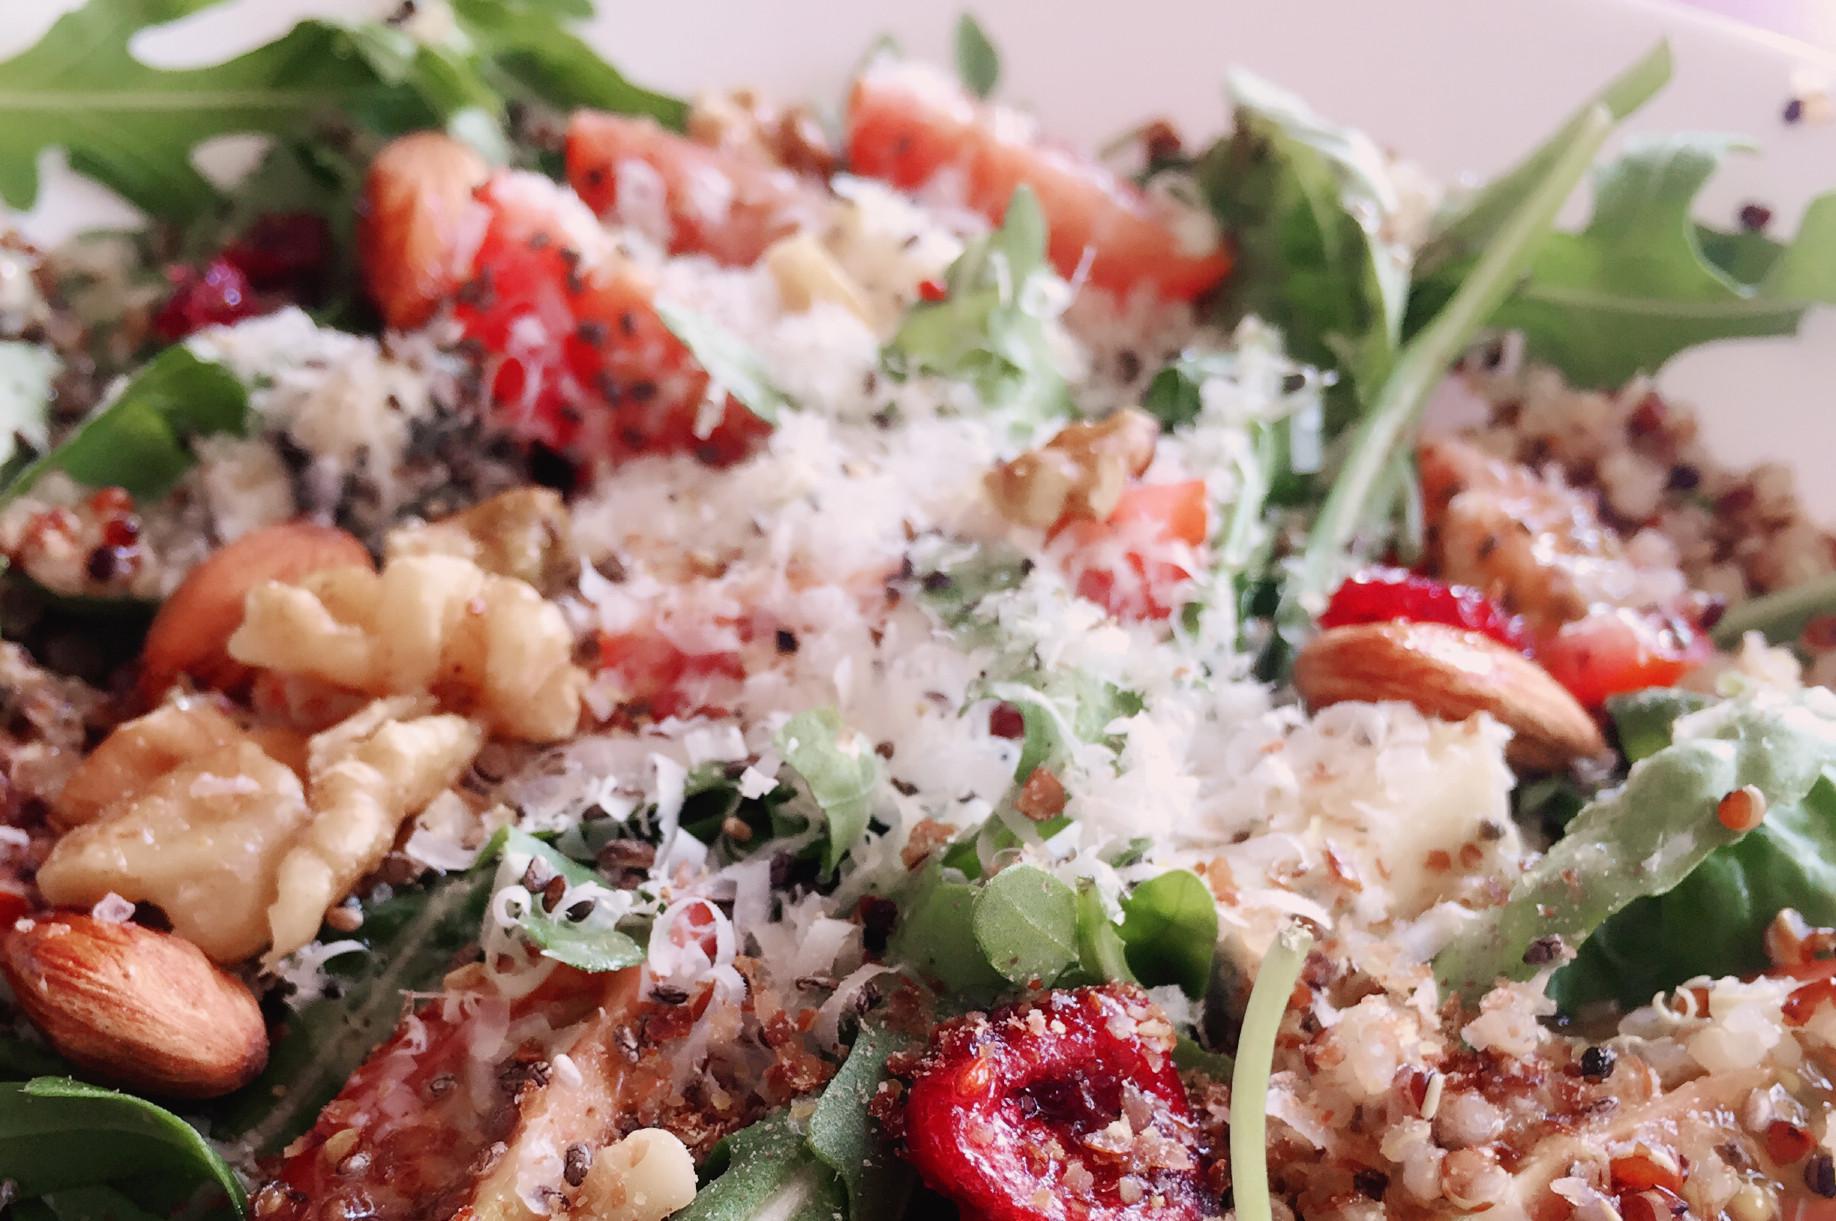 Healthy breakfast Singapore - Quinoa Salad